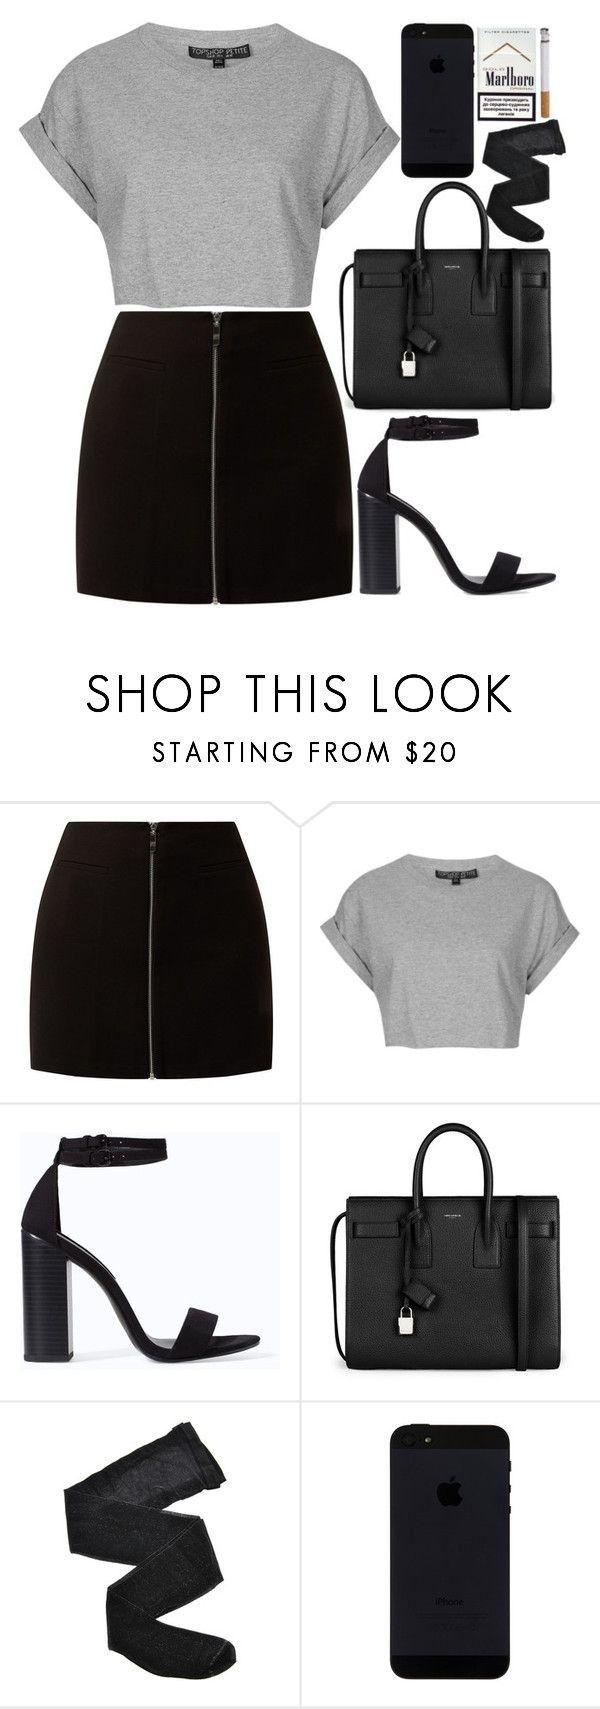 KEINE ZIGARETTEN - Outfit.GQ #shirtsale